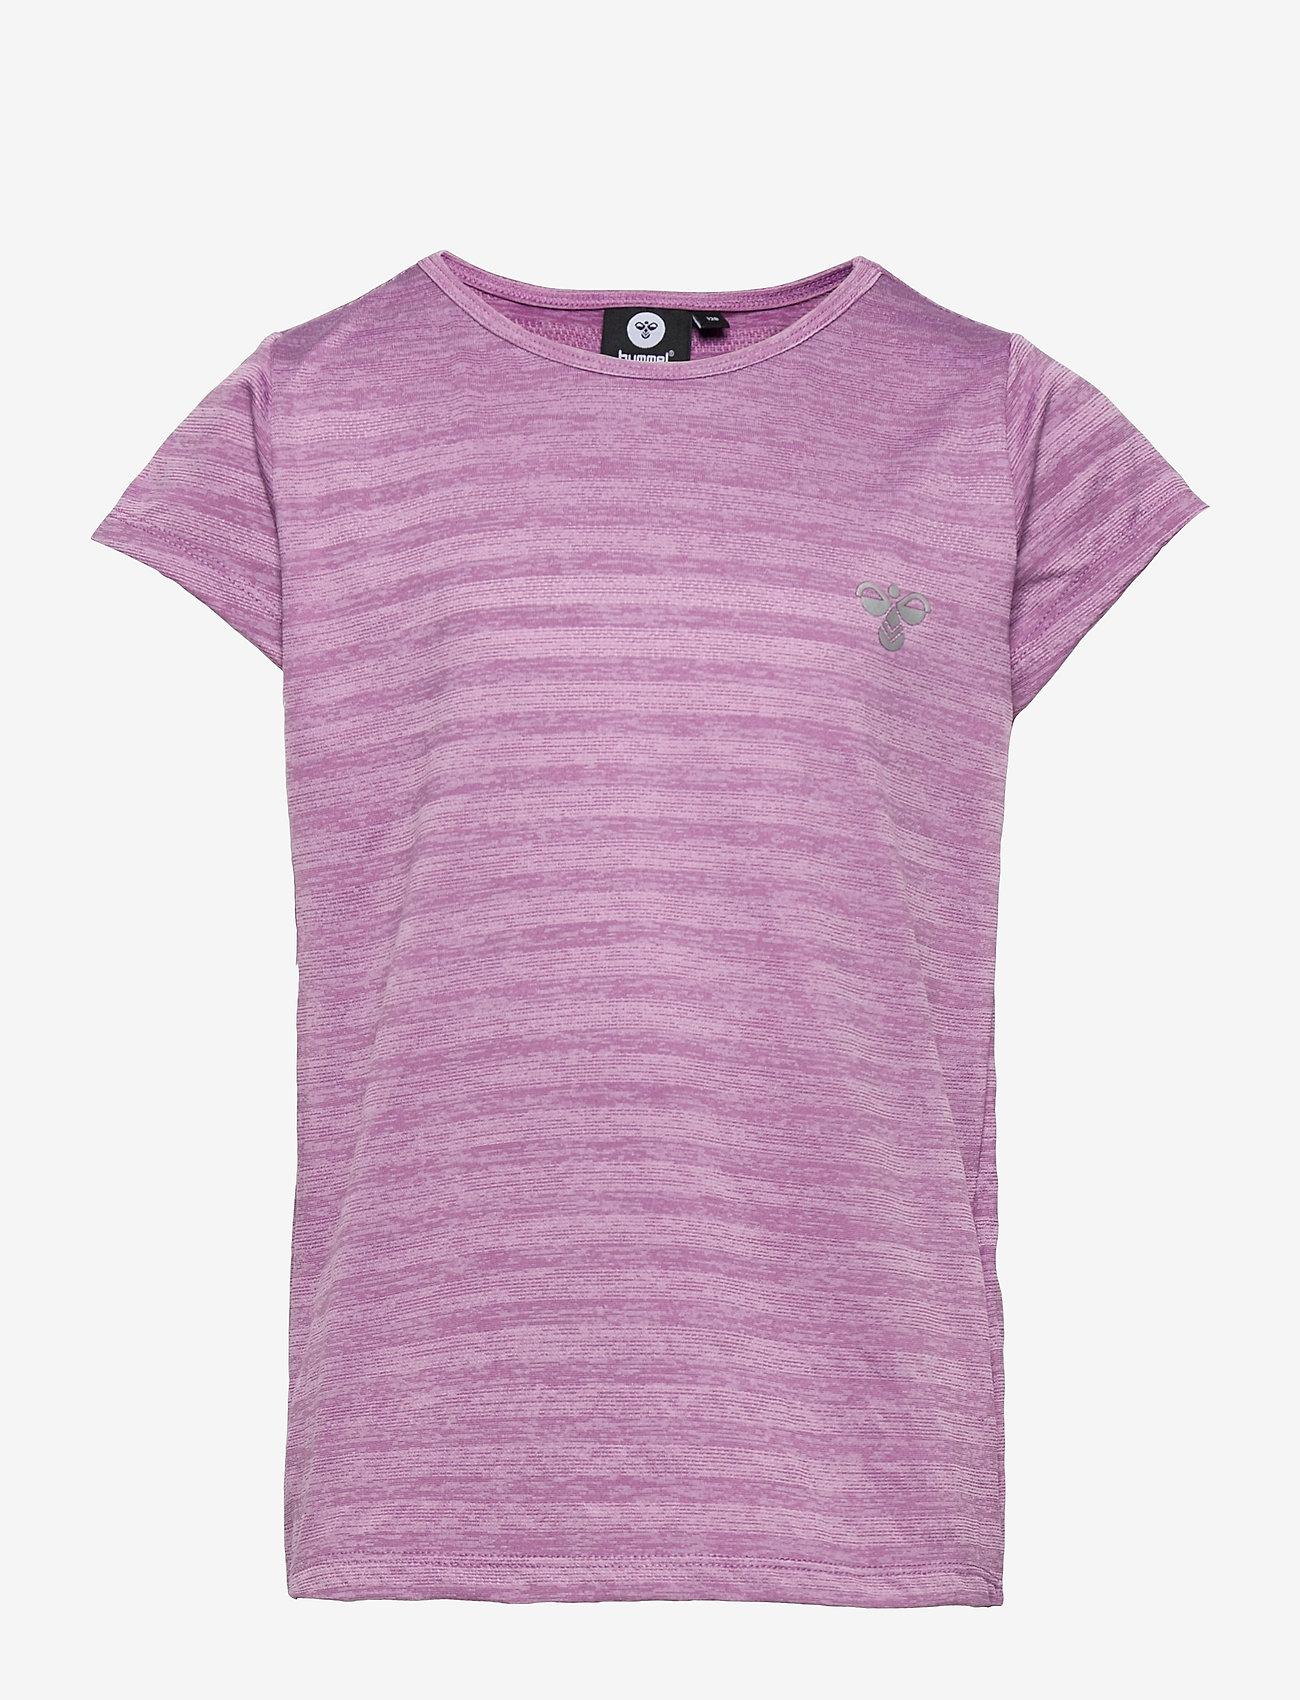 Hummel - hmlSUTKIN T-SHIRT S/S - short-sleeved - chinese violet - 0